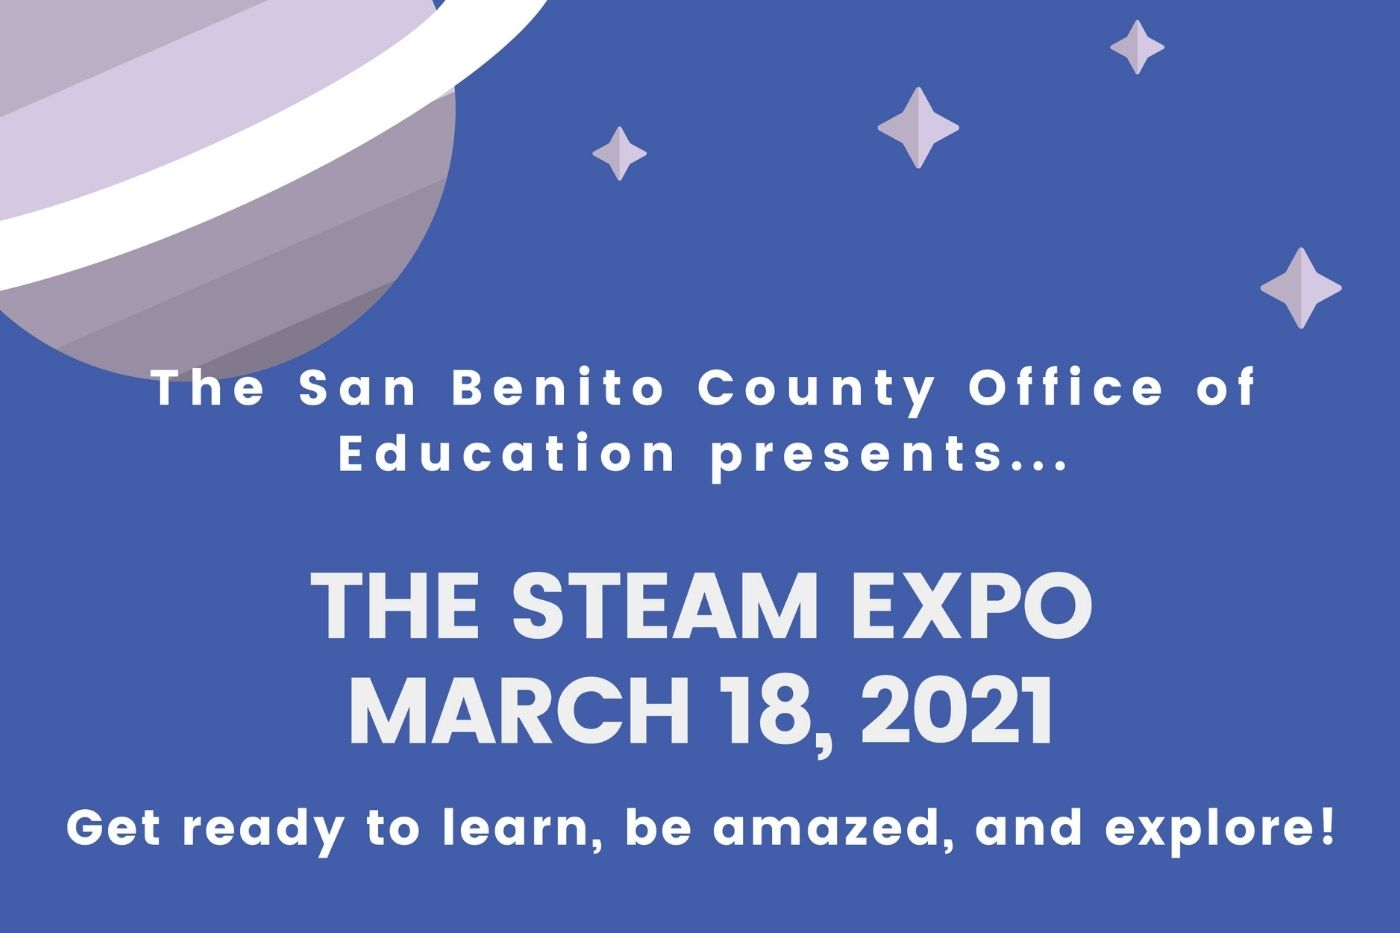 STEAM Expo 2021